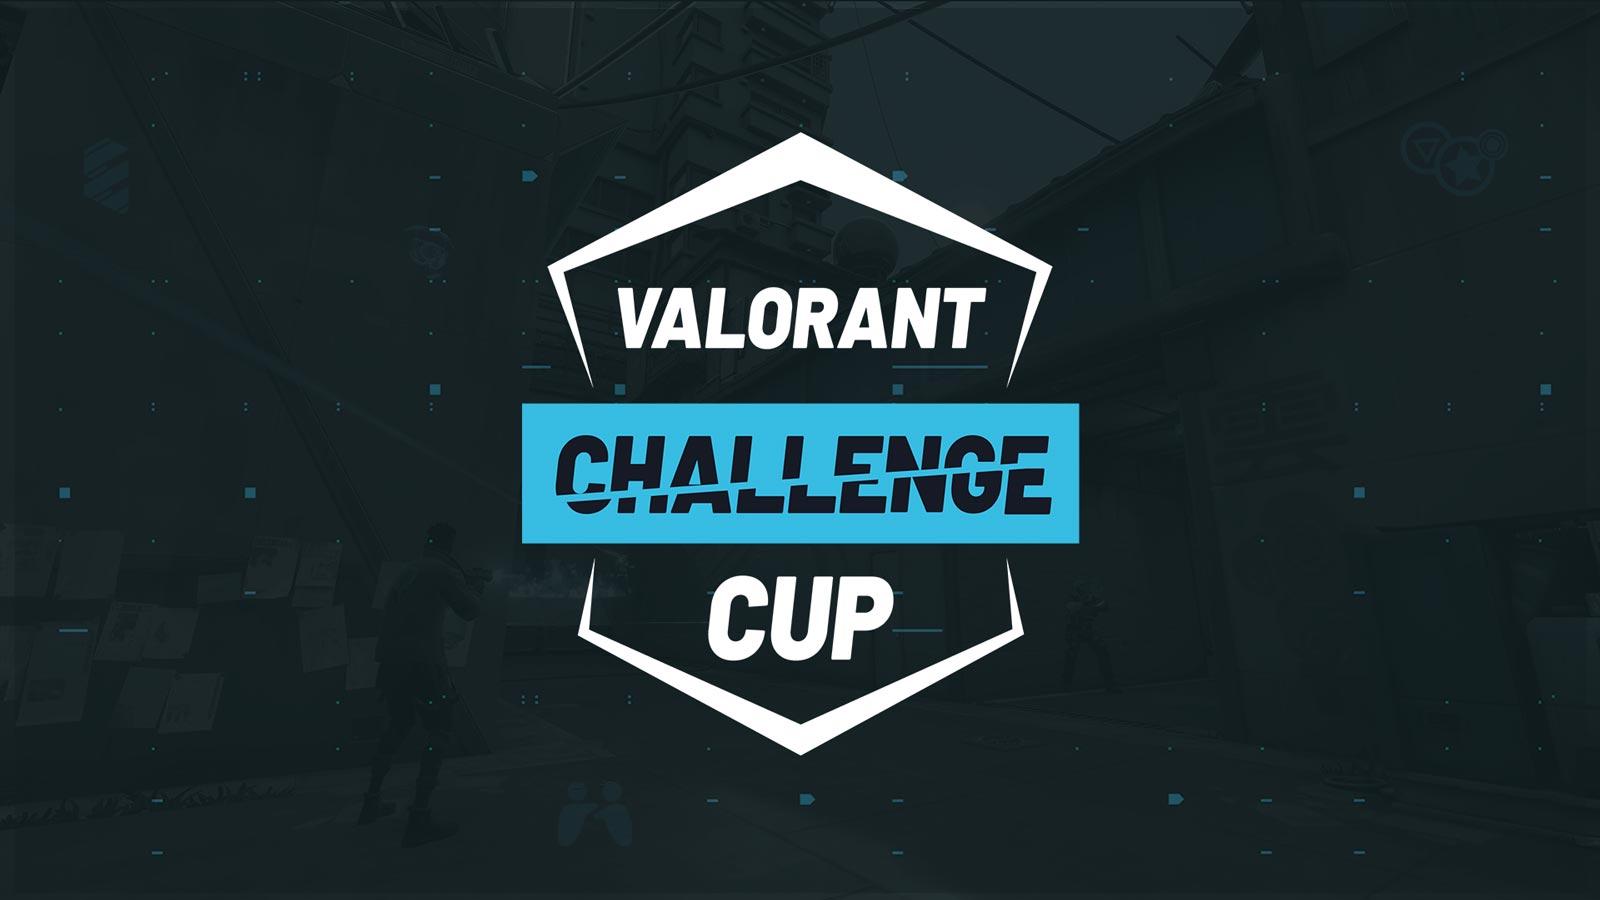 Valorant Challenge Cup